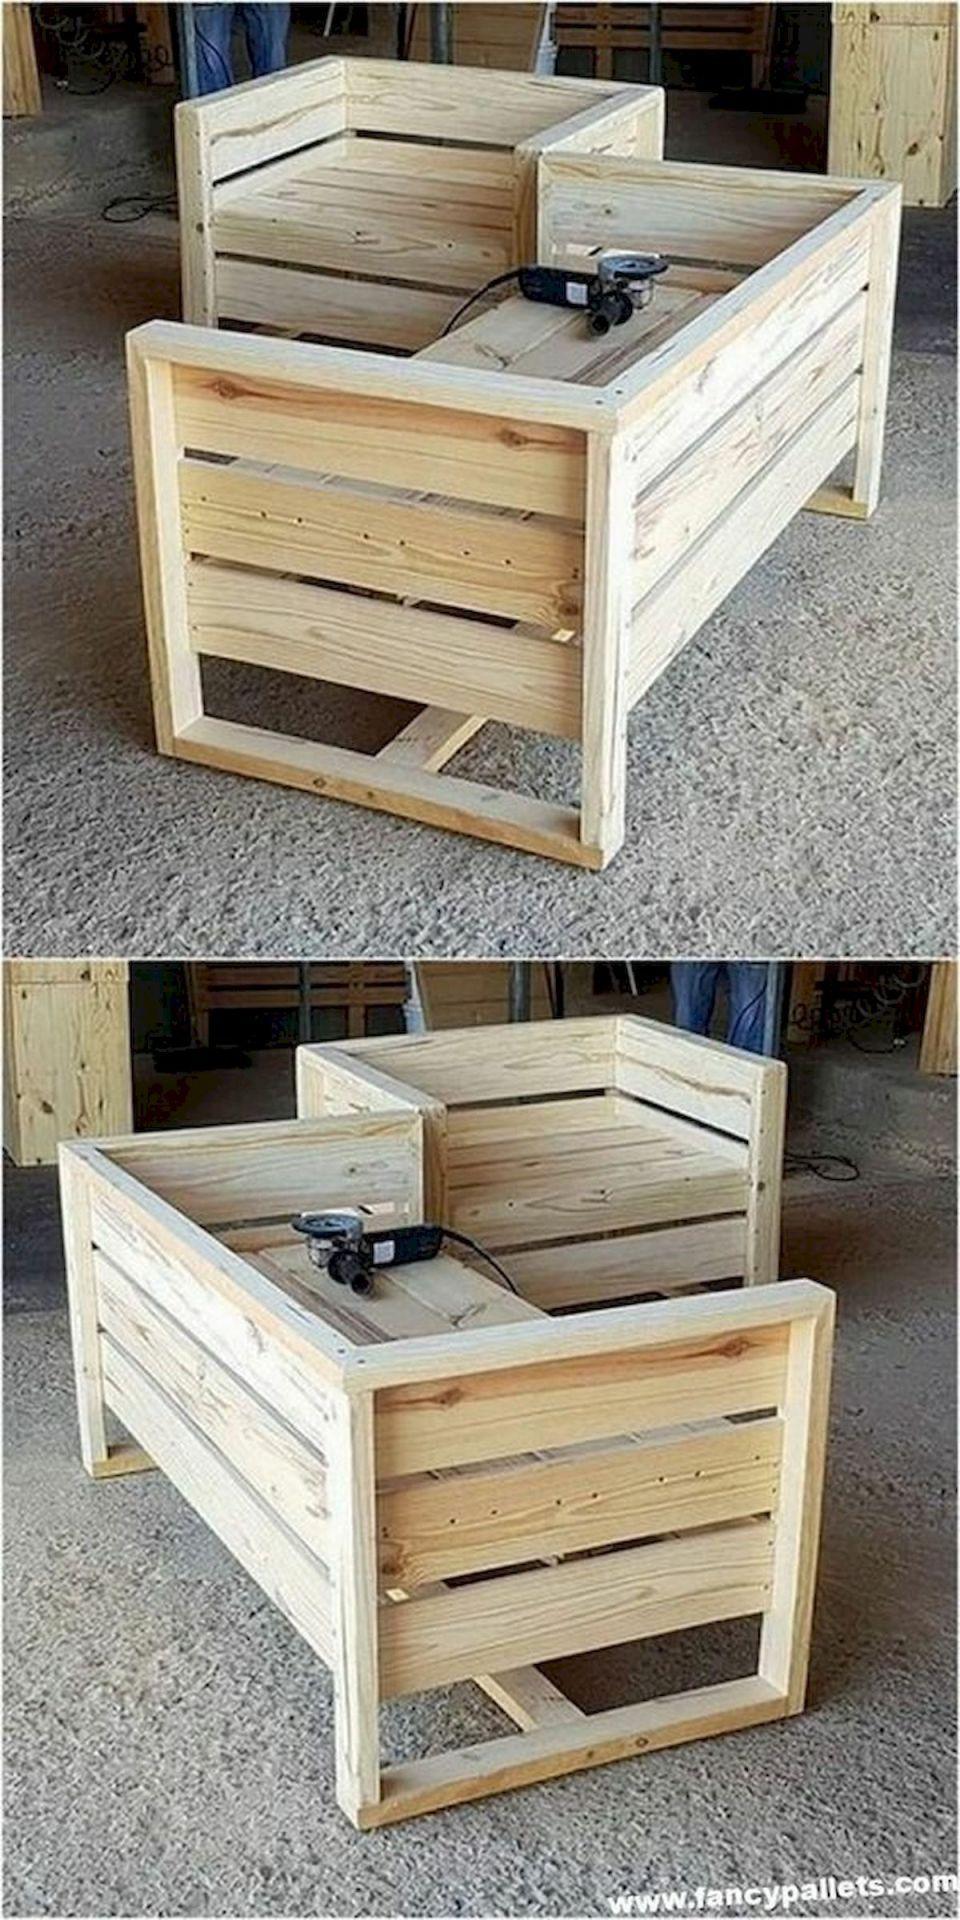 Fantastic creative diy furniture ideas